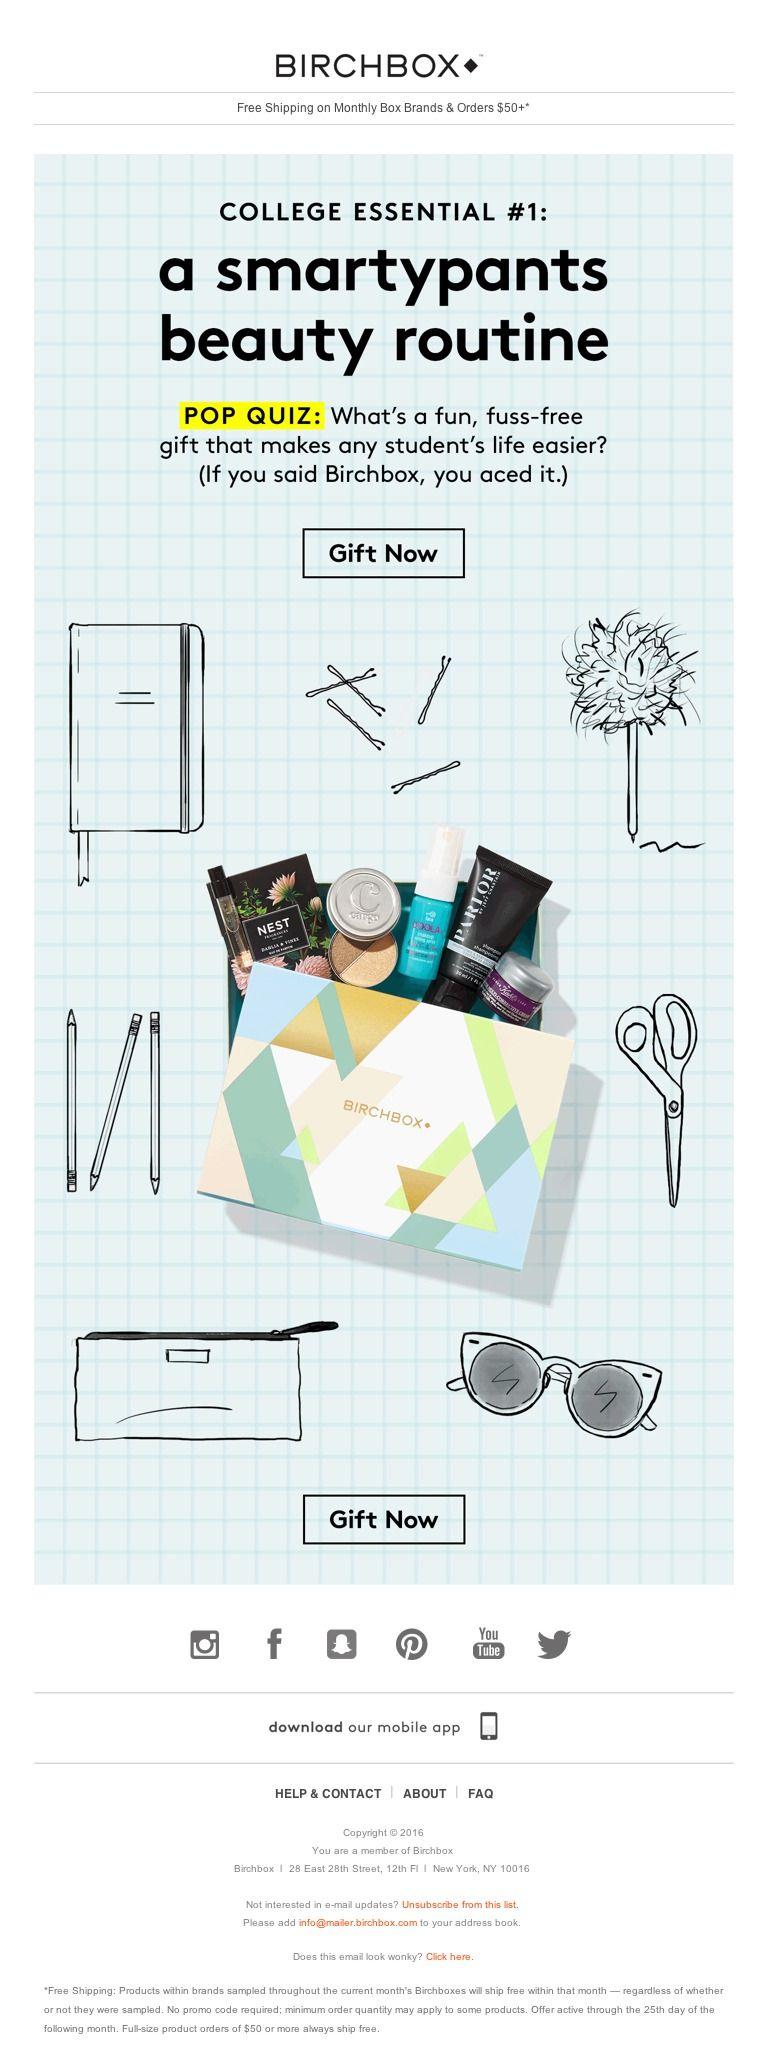 Birchbox - Laptop ✓ Coffeemaker ✓ Beauty Routine ✓